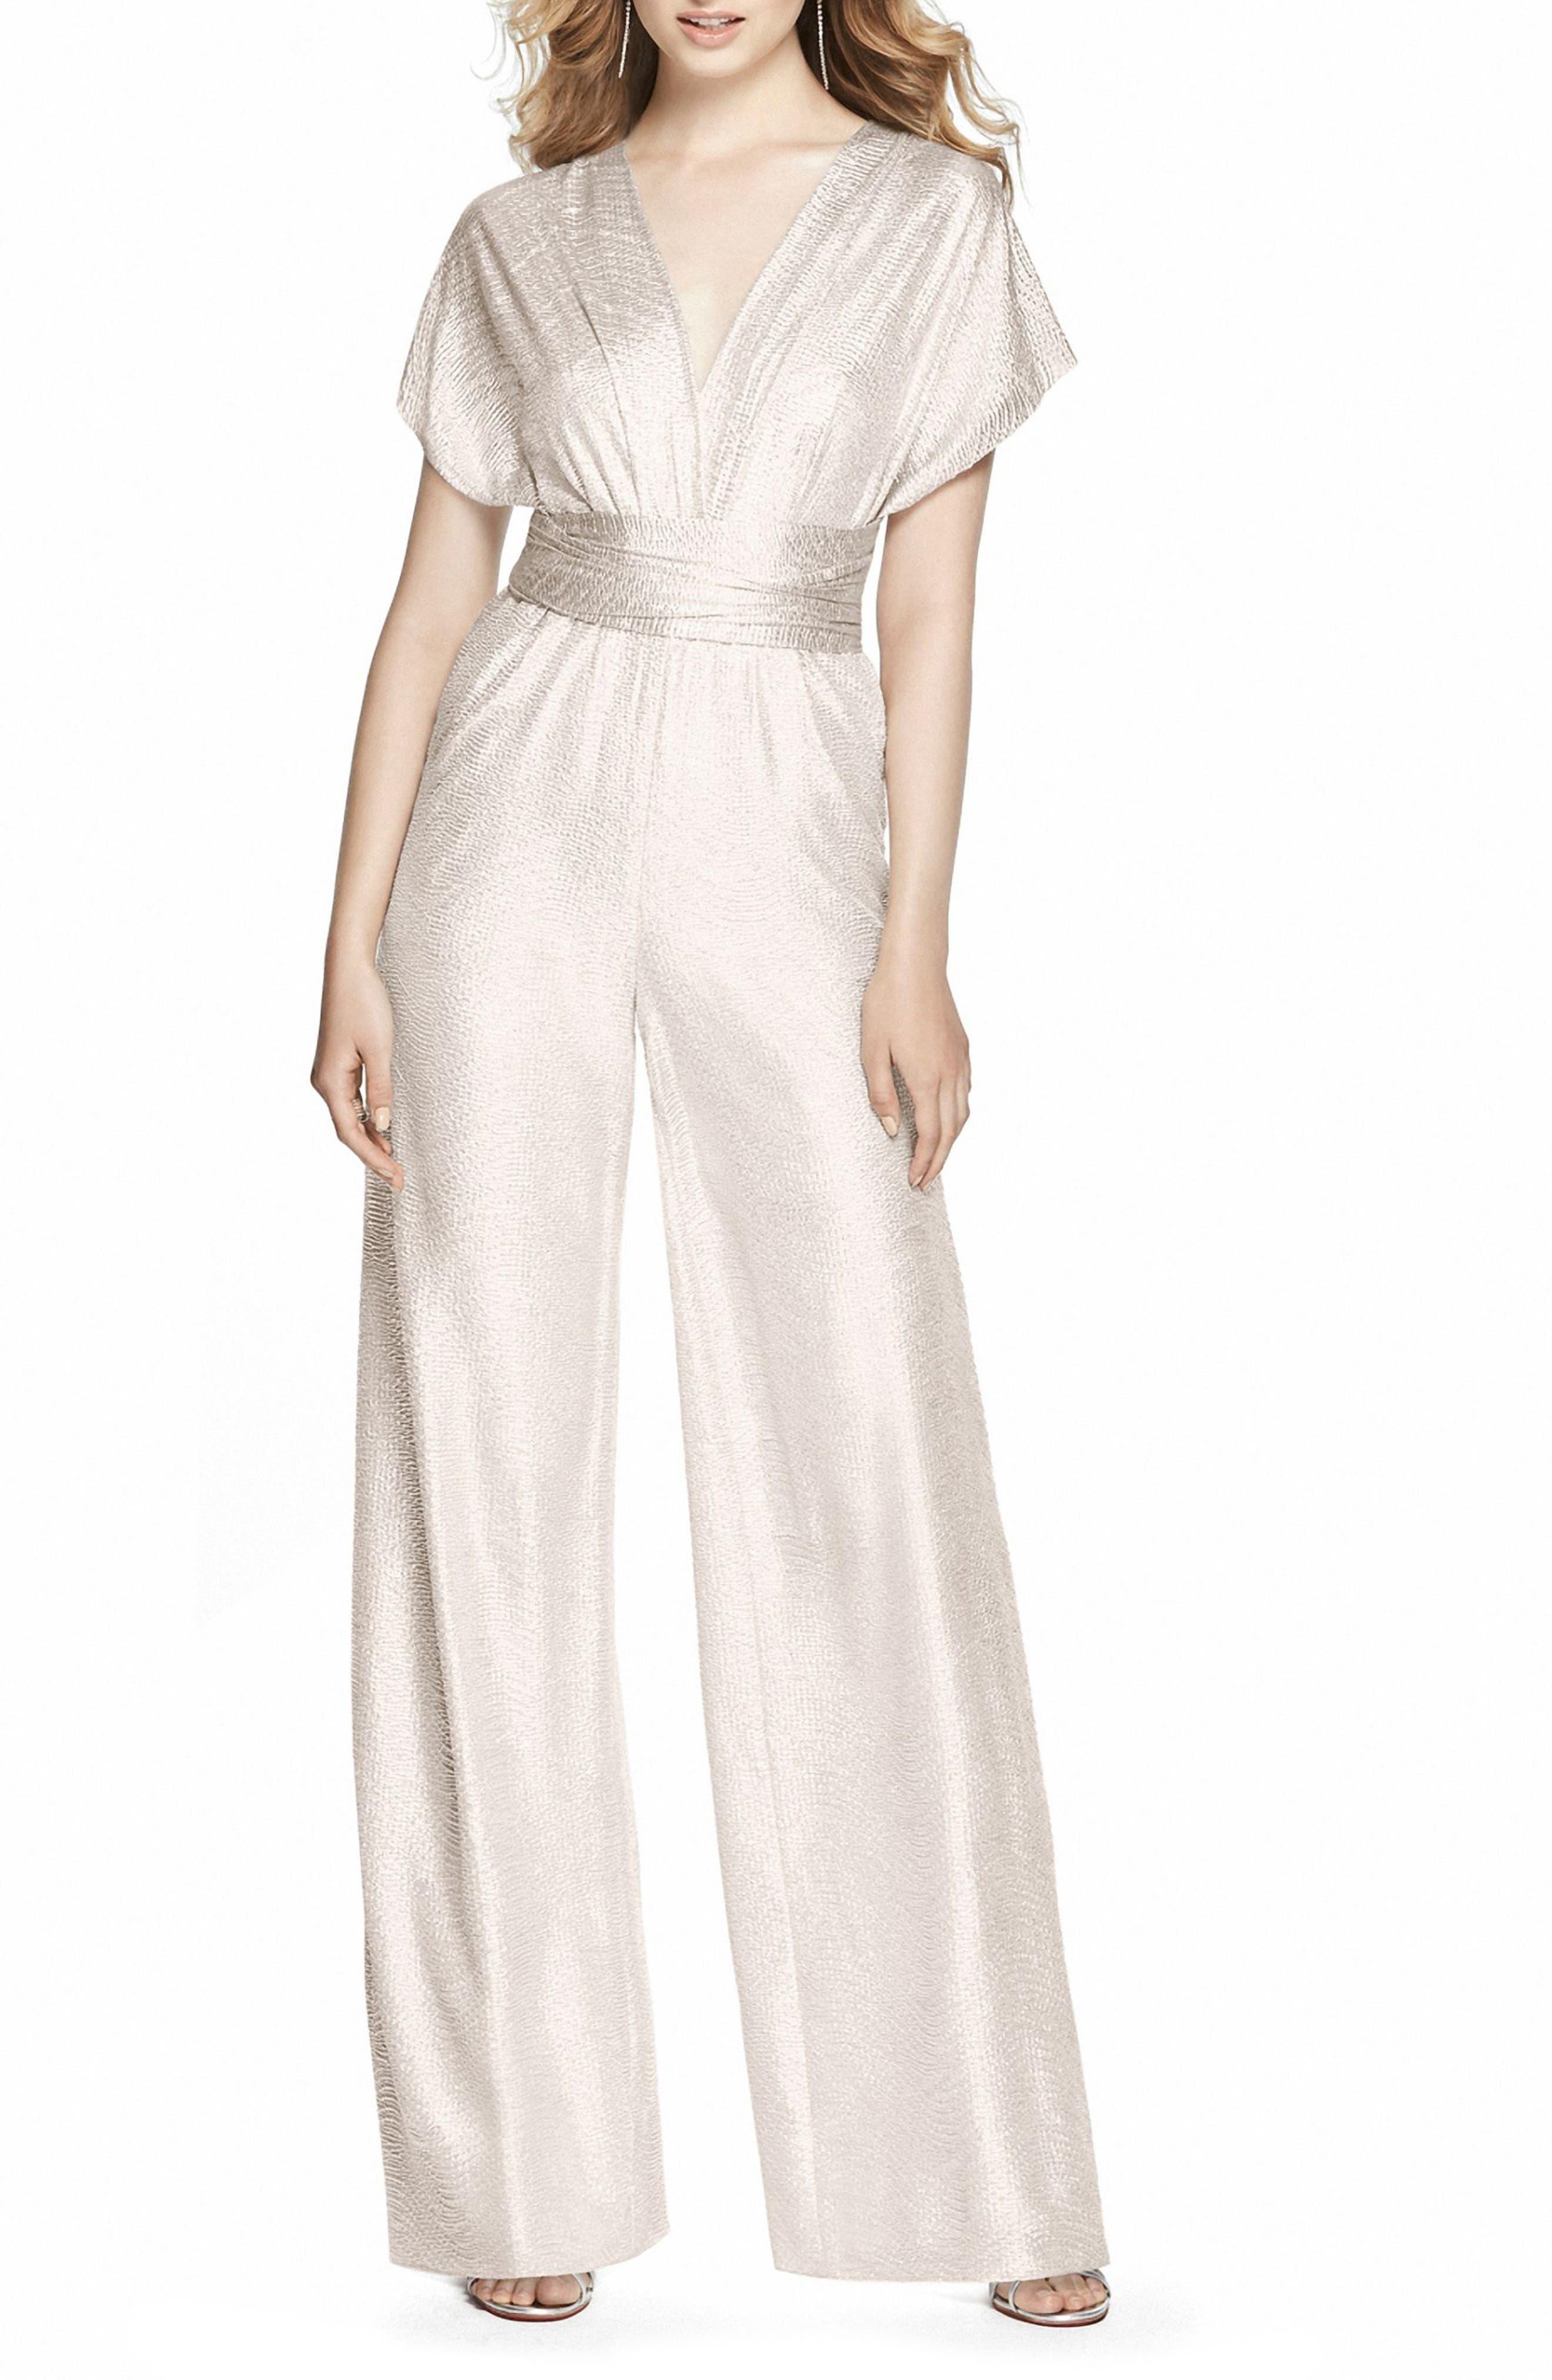 70s Dresses – Disco Dress, Hippie Dress, Wrap Dress Womens Dessy Collection Twist Convertible Wide Leg Jumpsuit Size Small - Metallic $168.00 AT vintagedancer.com